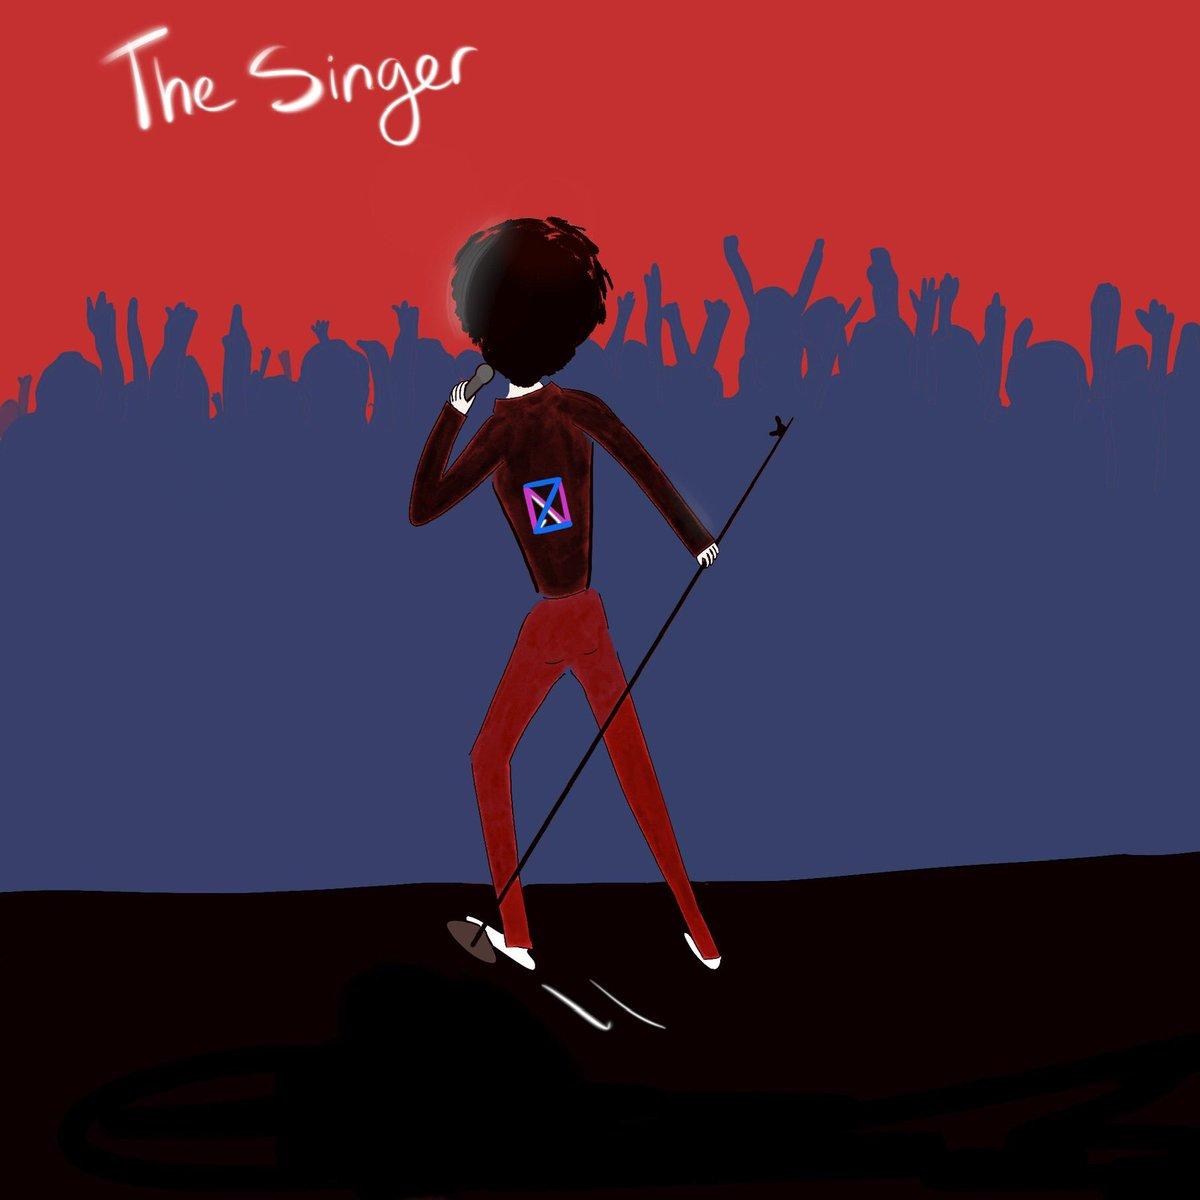 @NathanZanagar at #silencioclub #paris #concert #singer #continentscarnivore @viaAlta1 https://t.co/TMY07dWZhF